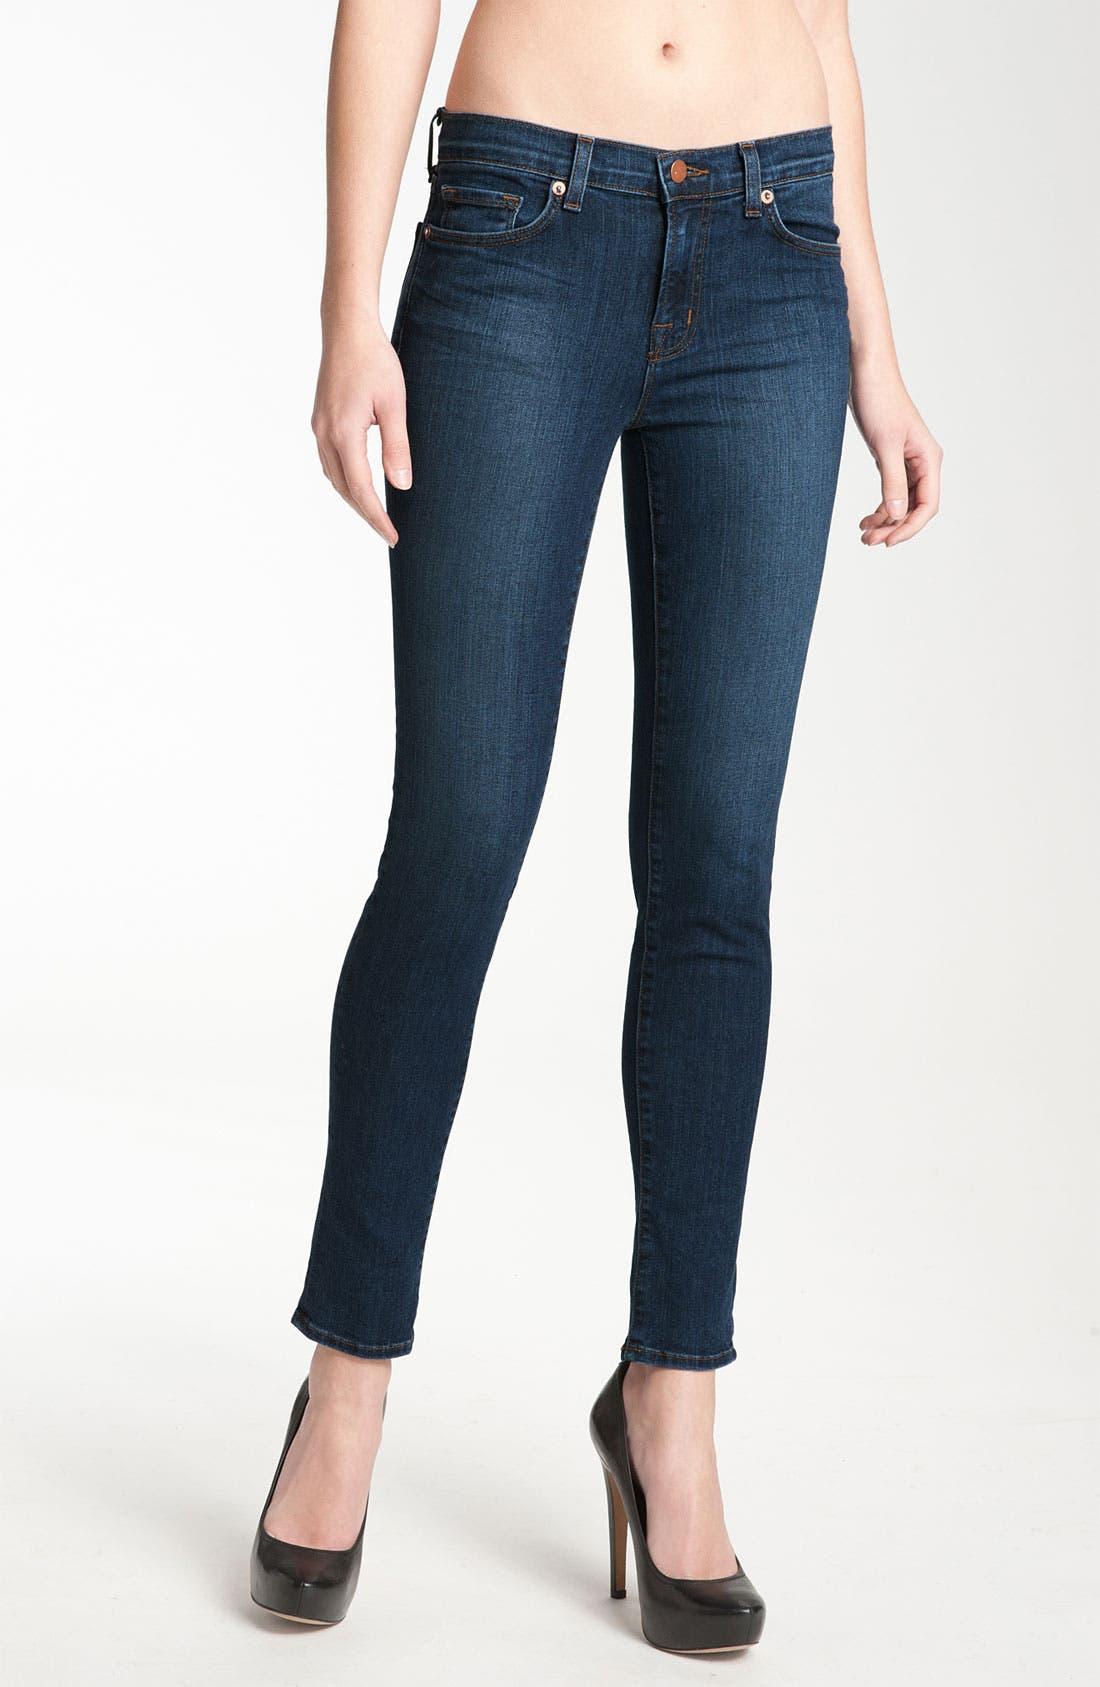 Alternate Image 1 Selected - J Brand '811' Skinny Stretch Jeans (Vivid)